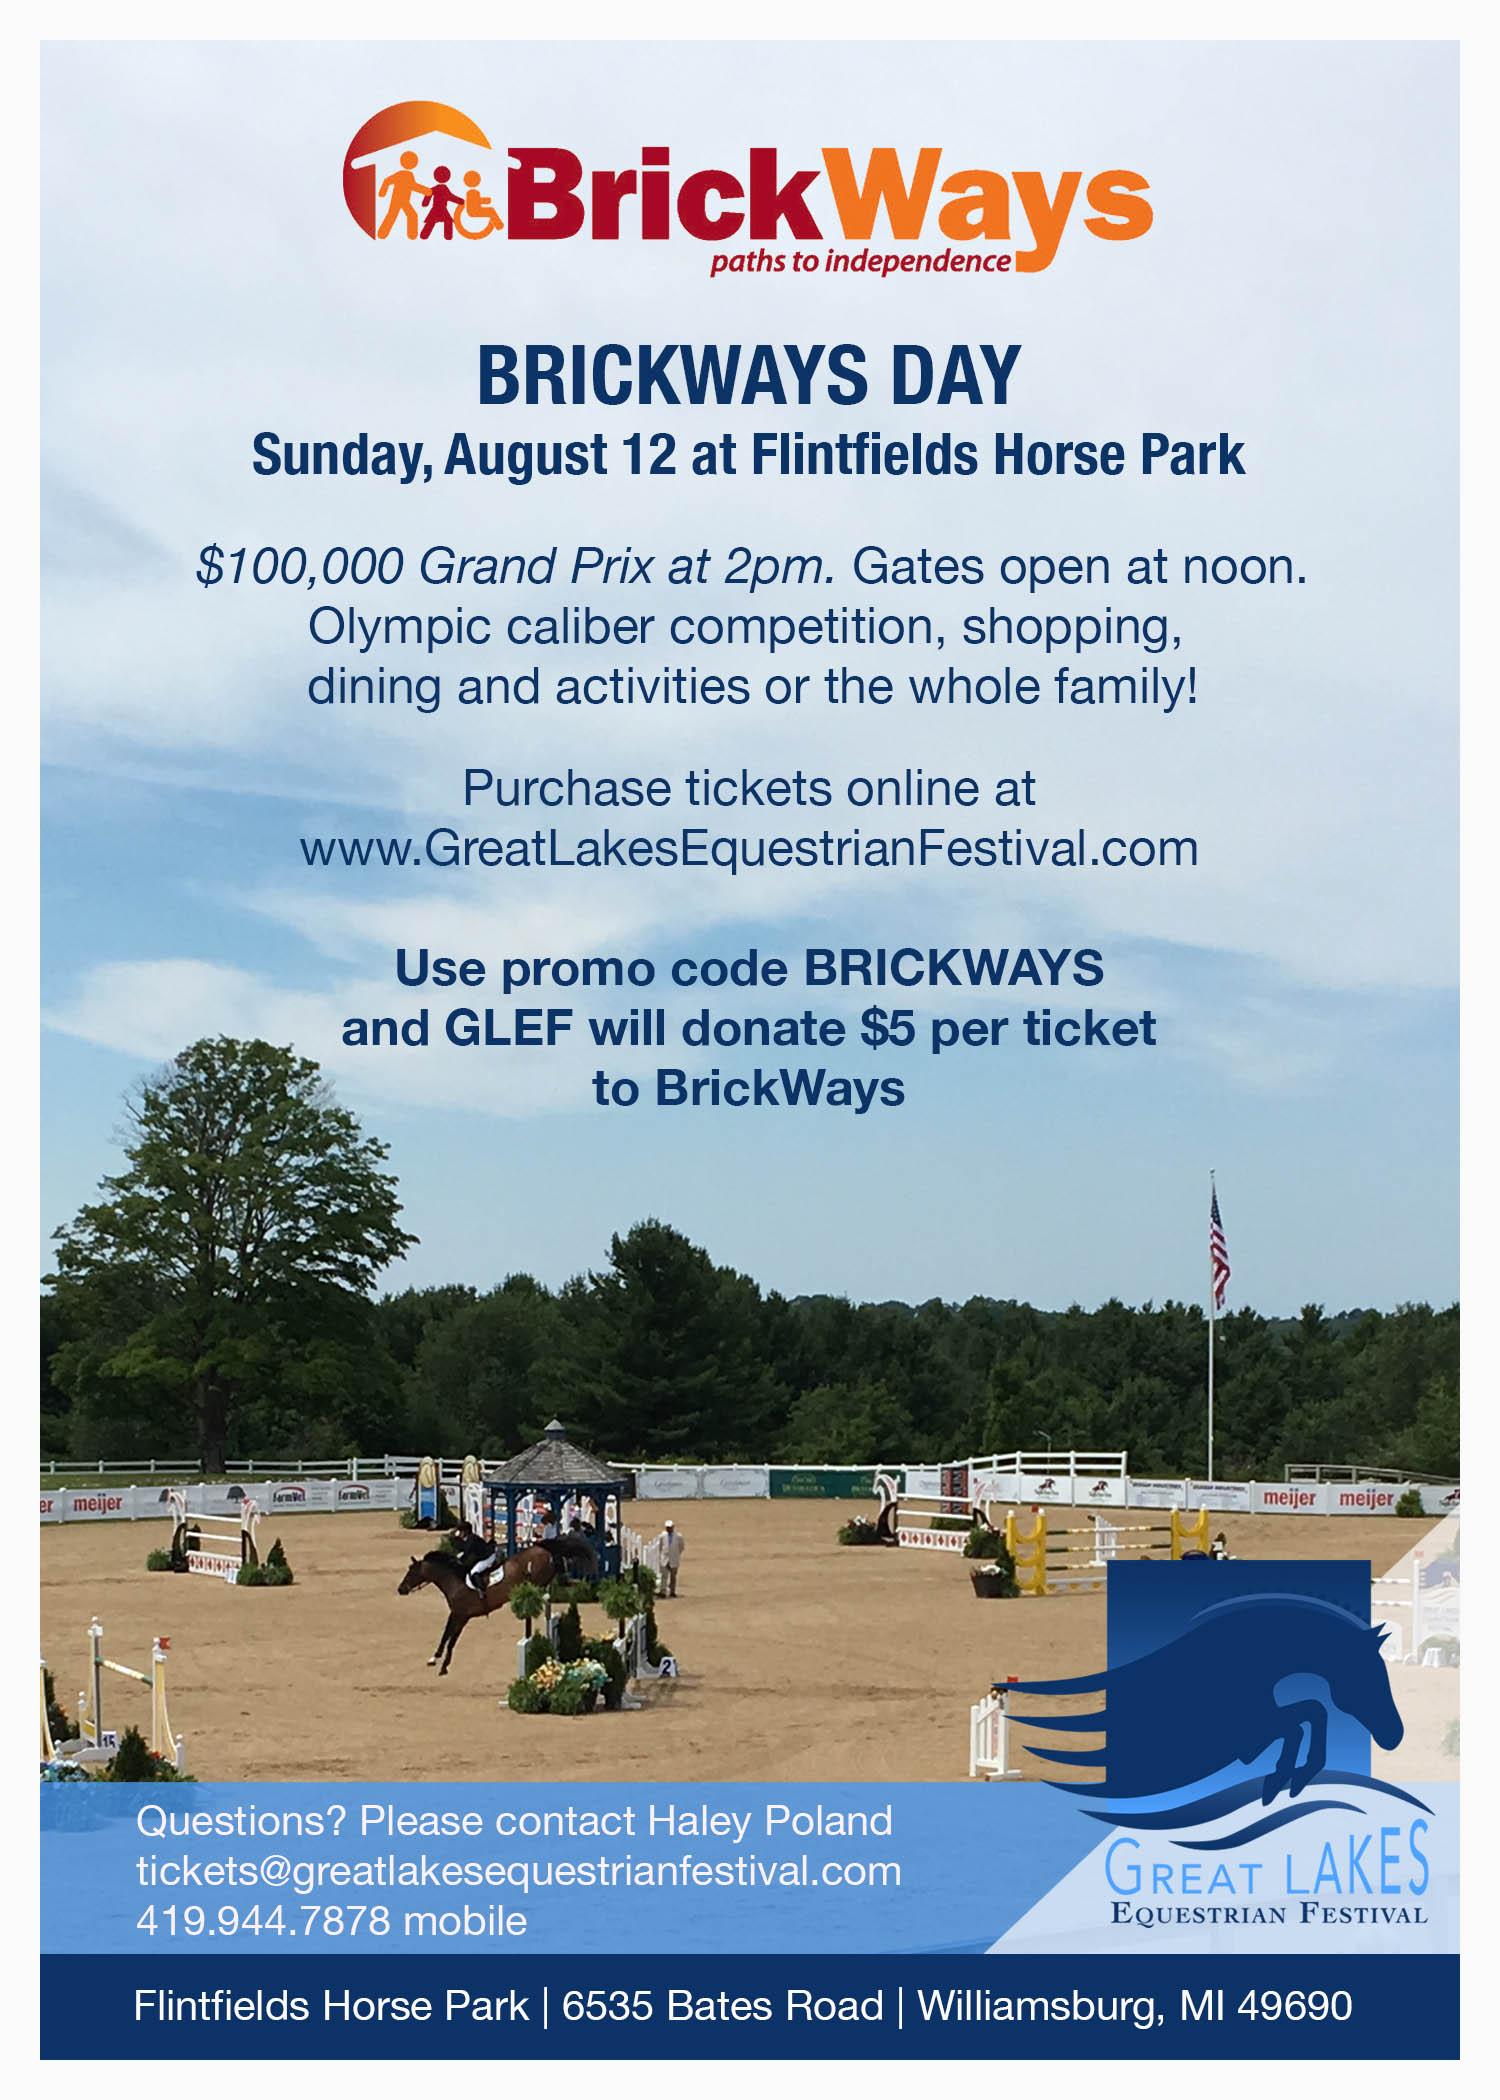 Brickways_2018 GLEF Fundraising Ticket Flyer.jpg